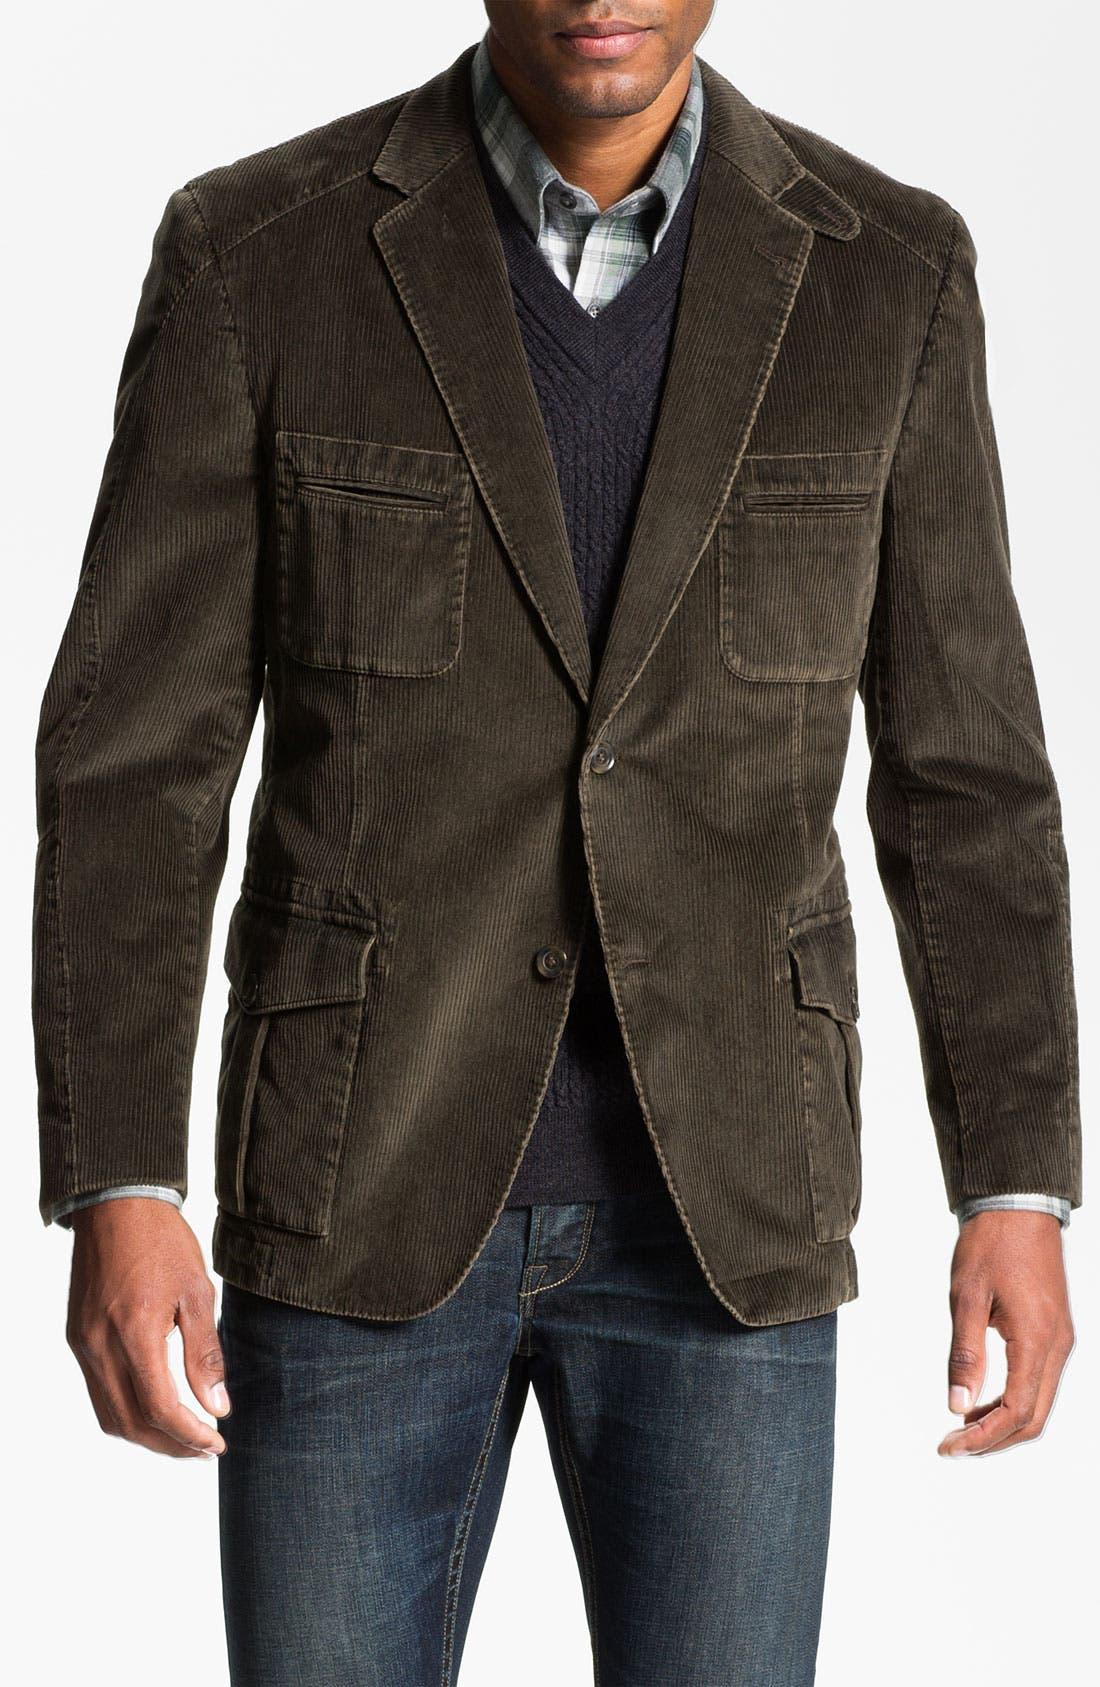 Main Image - Kroon 'Matthews' Washed Corduroy Sportcoat